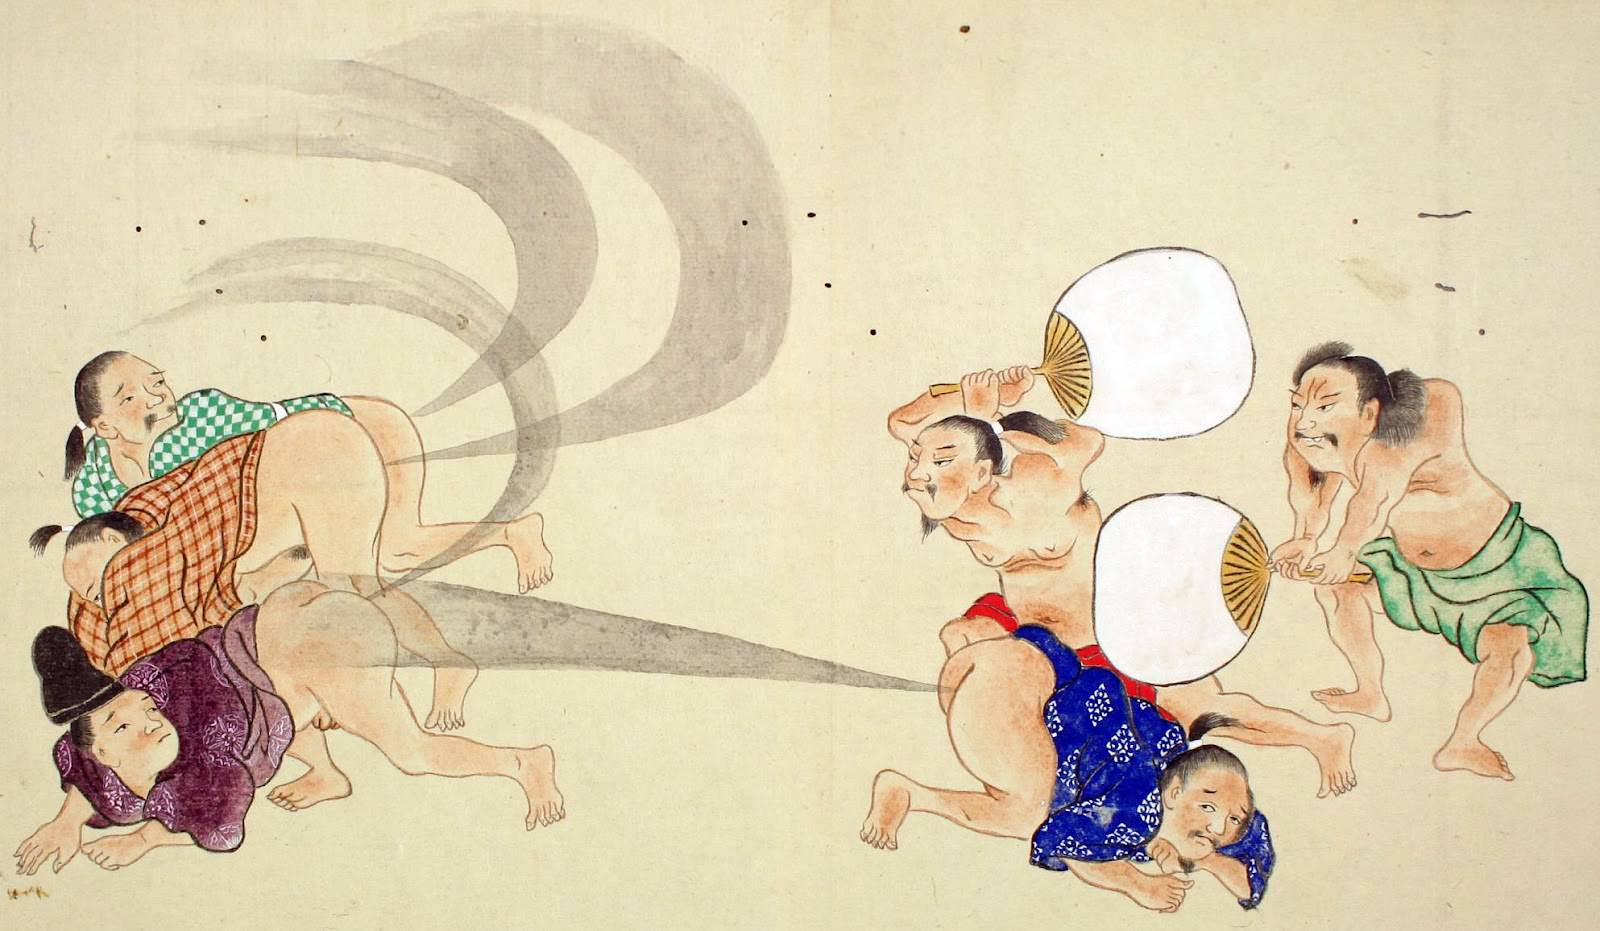 drevnie tradicii yaponii puk konkurs Древние традиции Японии. Пук конкурс